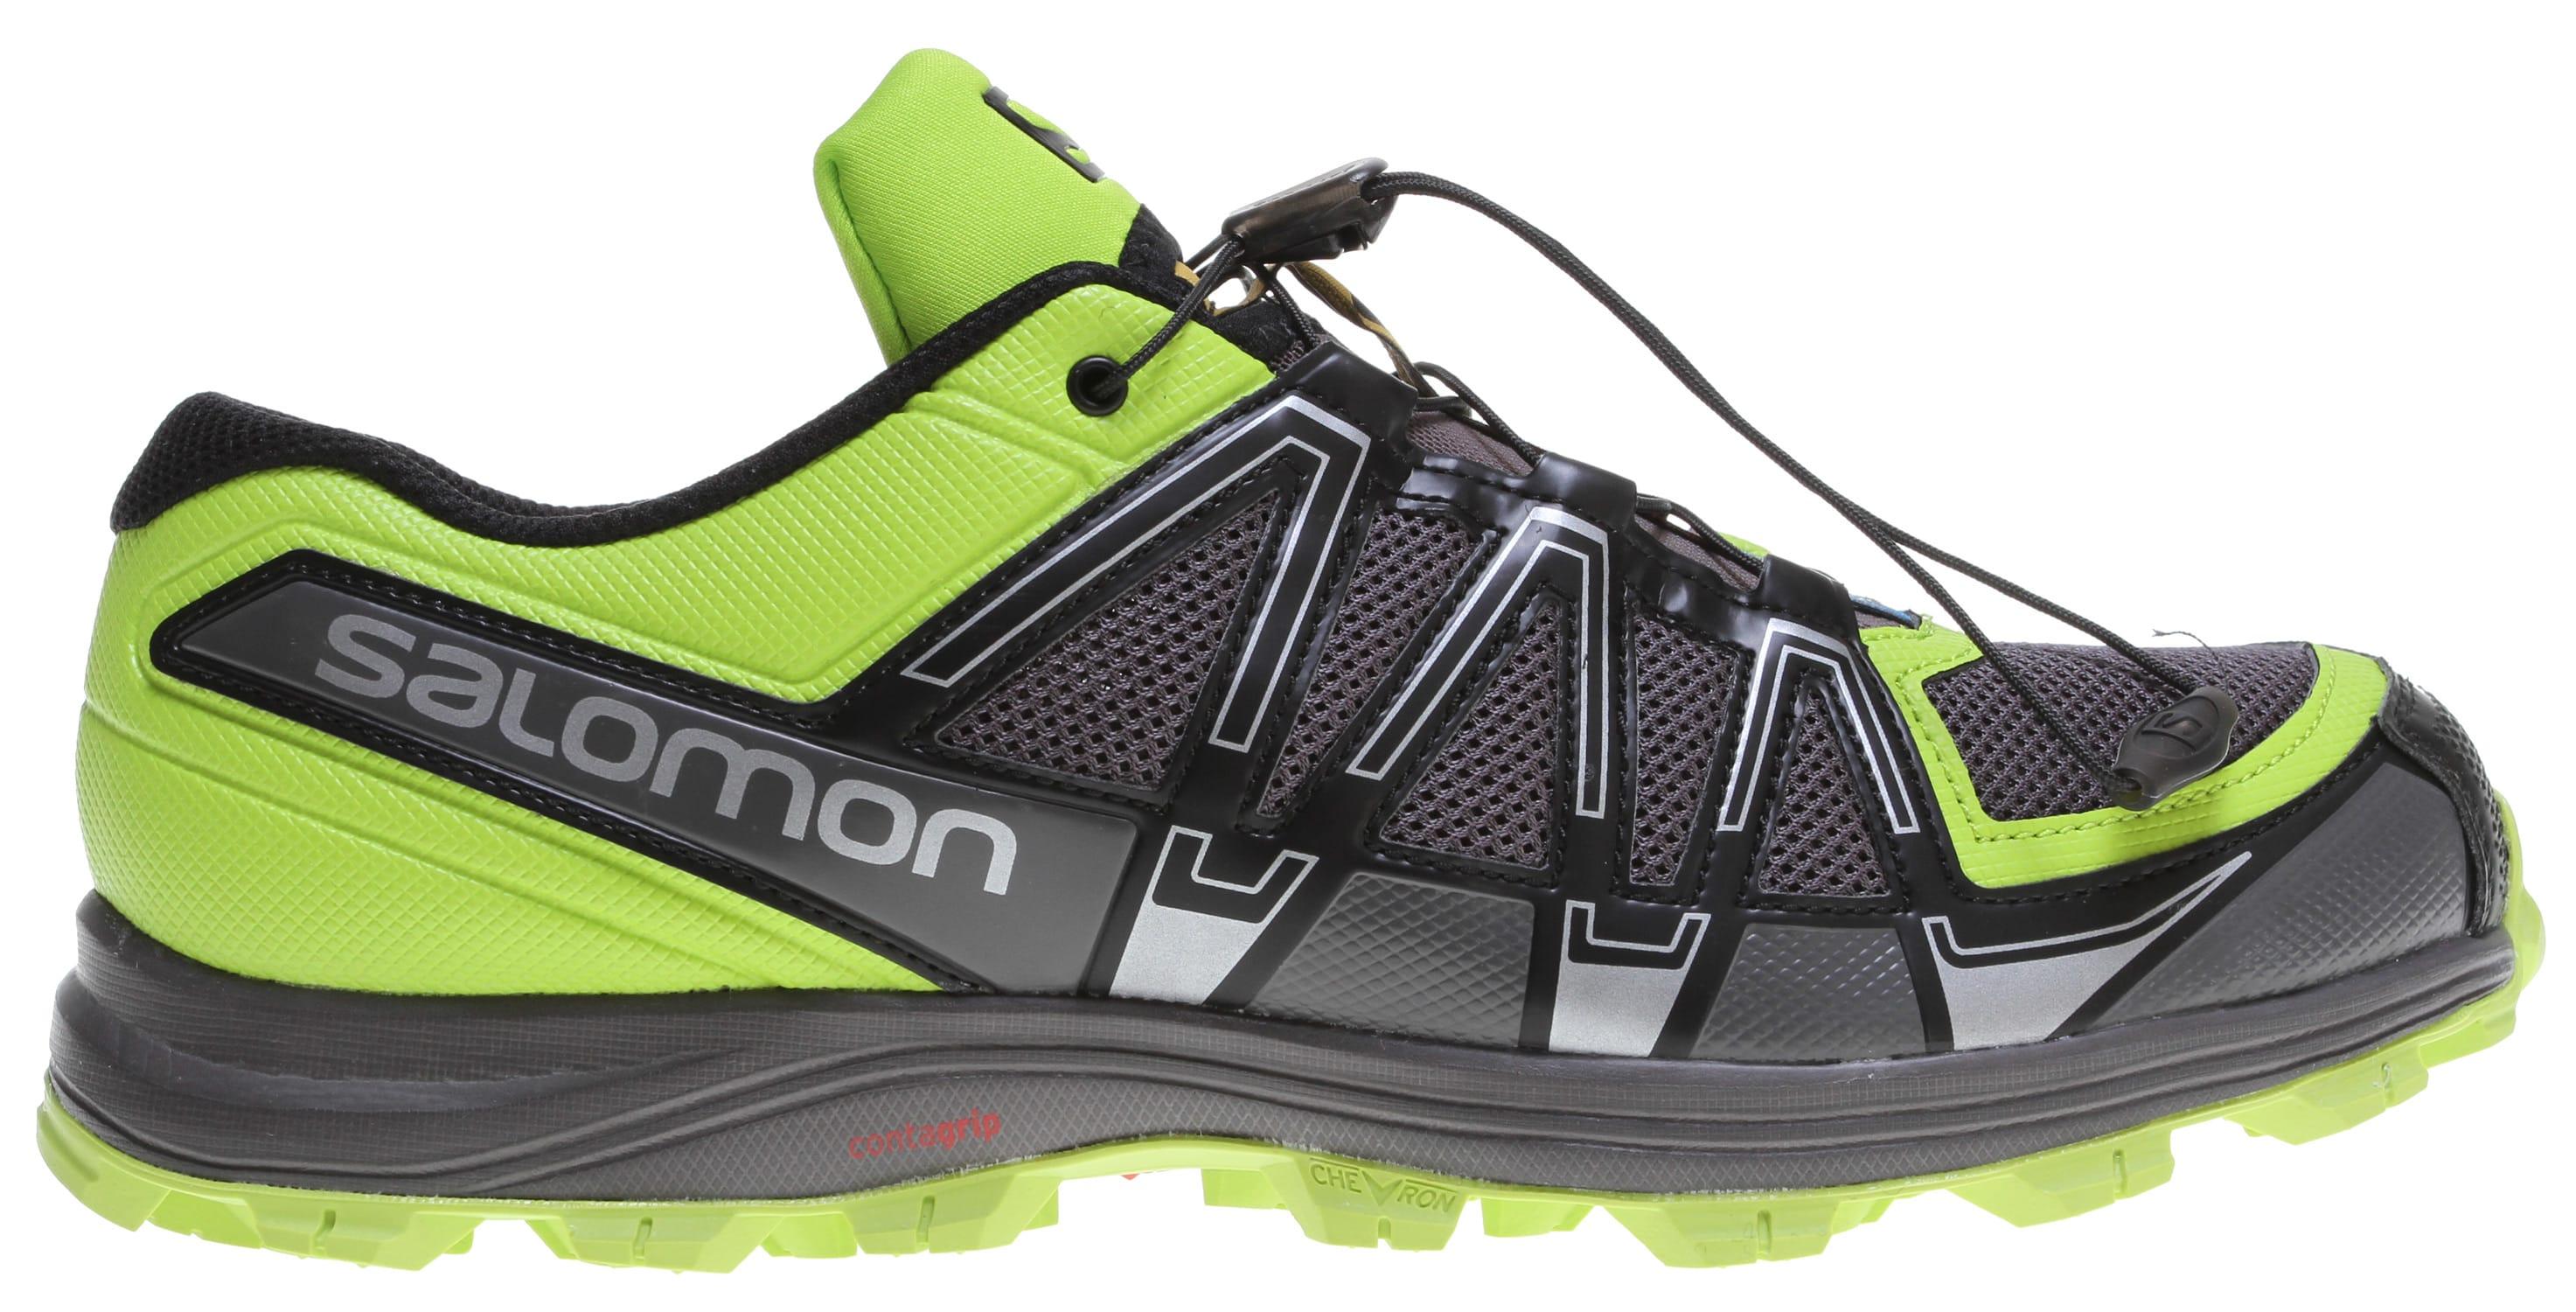 new style 1bd6f 1f6d3 Salomon Fellraiser Shoes - thumbnail 1